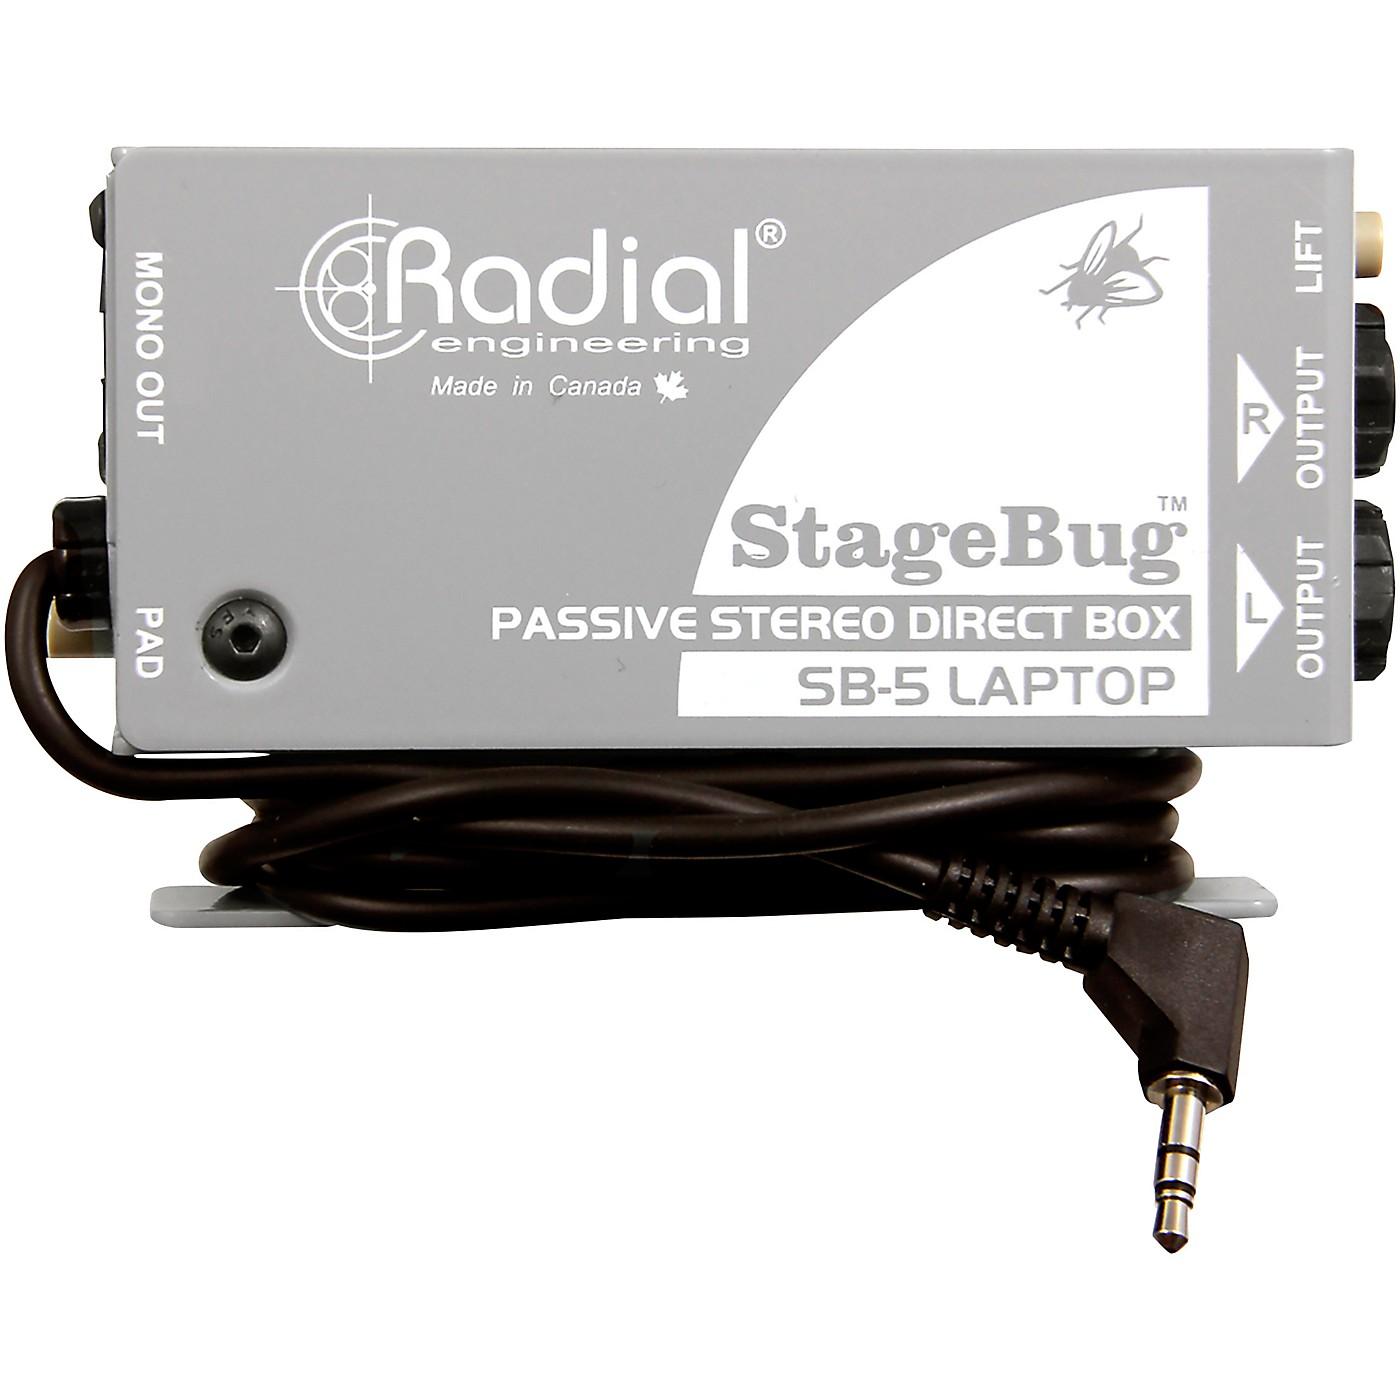 Radial Engineering StageBug SB-5 Stereo Laptop Direct Box thumbnail